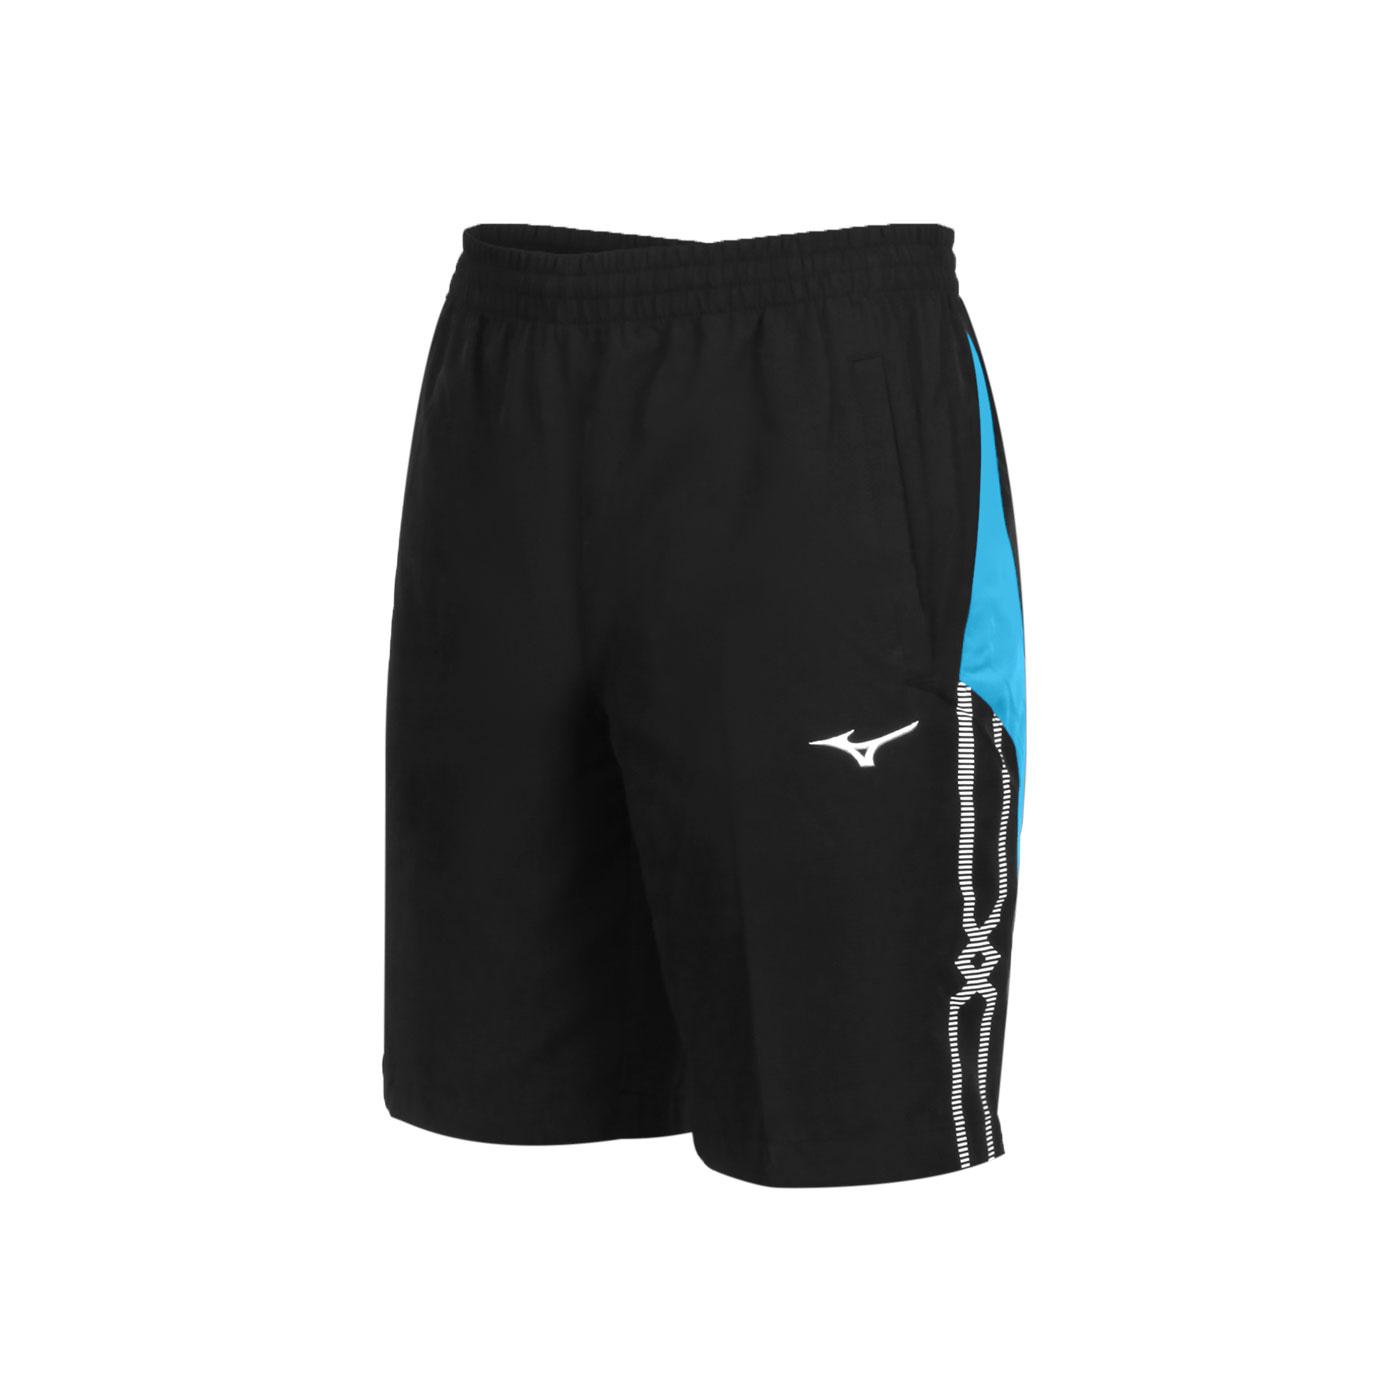 MIZUNO 男款平織運動短褲 32TB055314 - 黑水藍白